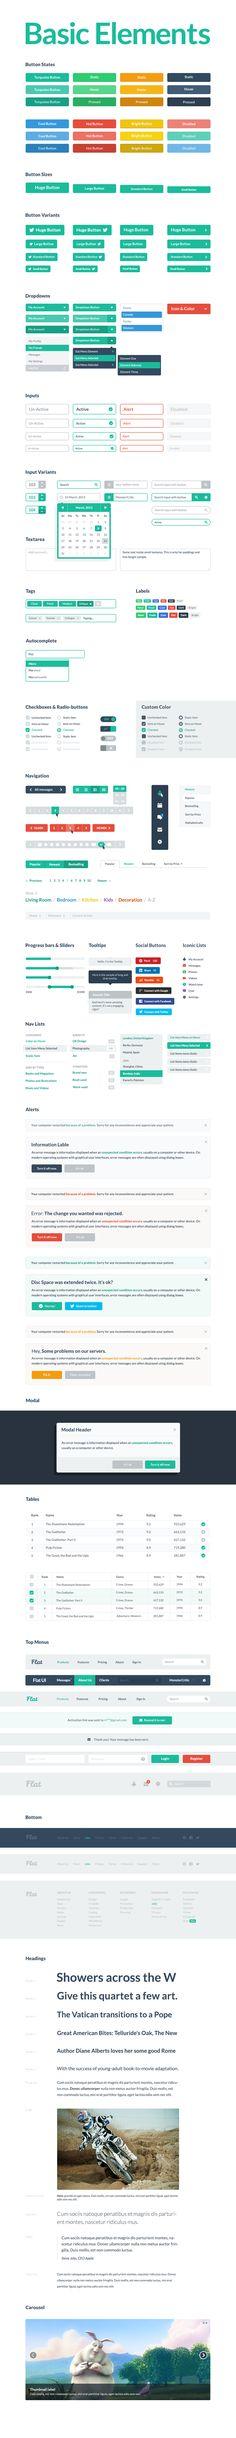 http://designmodo.com/wp-content/themes/designmodov2/flat-ui/images/1.Basic-Elements.png